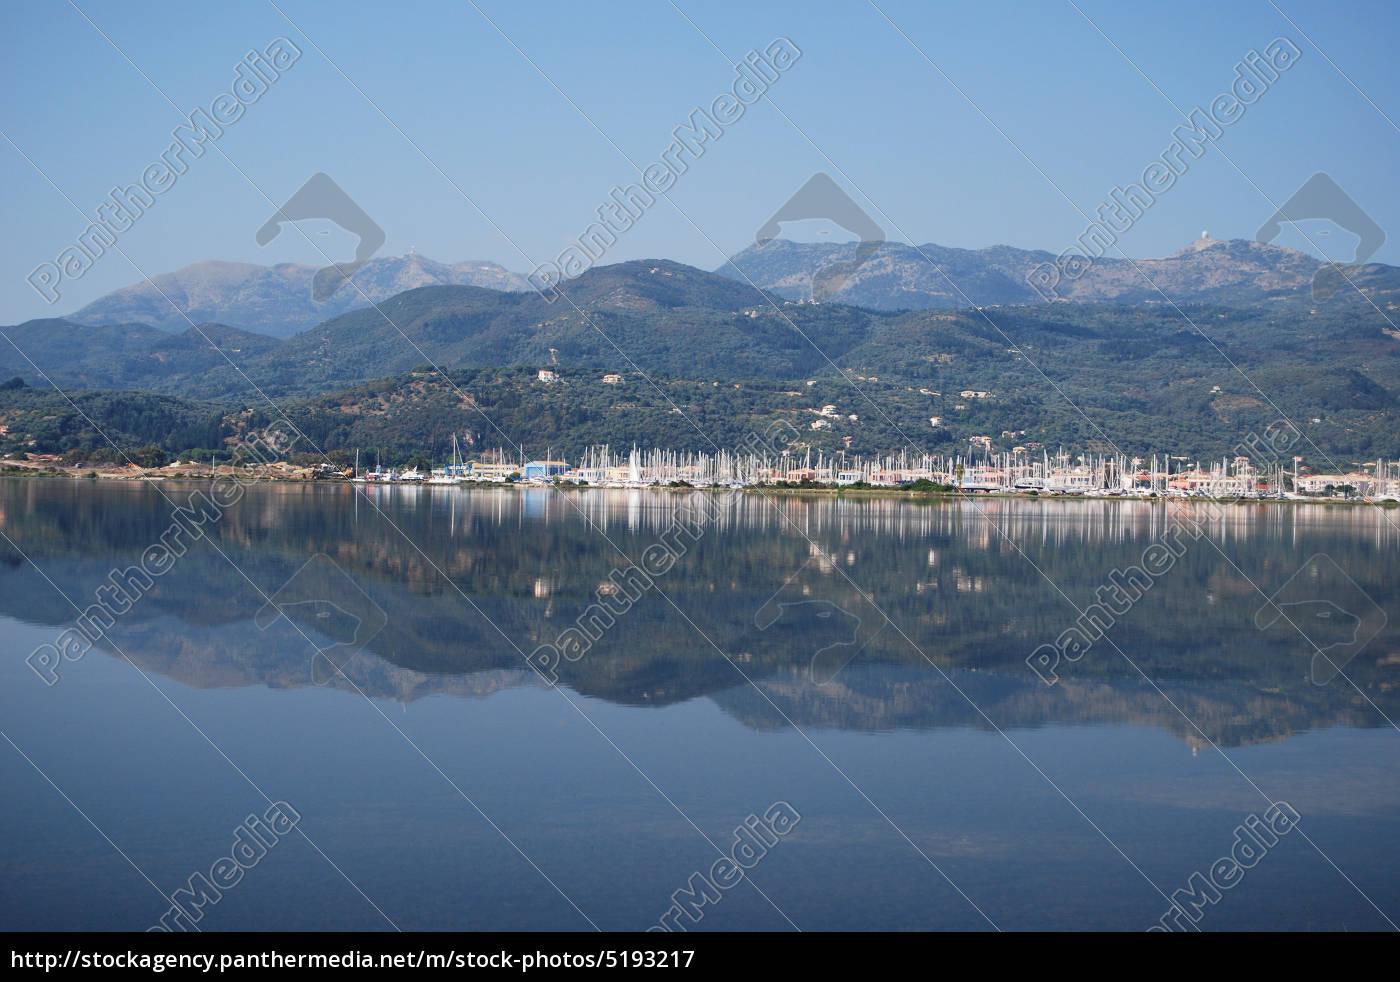 overlooking, the, marina, of, lefkada - 5193217